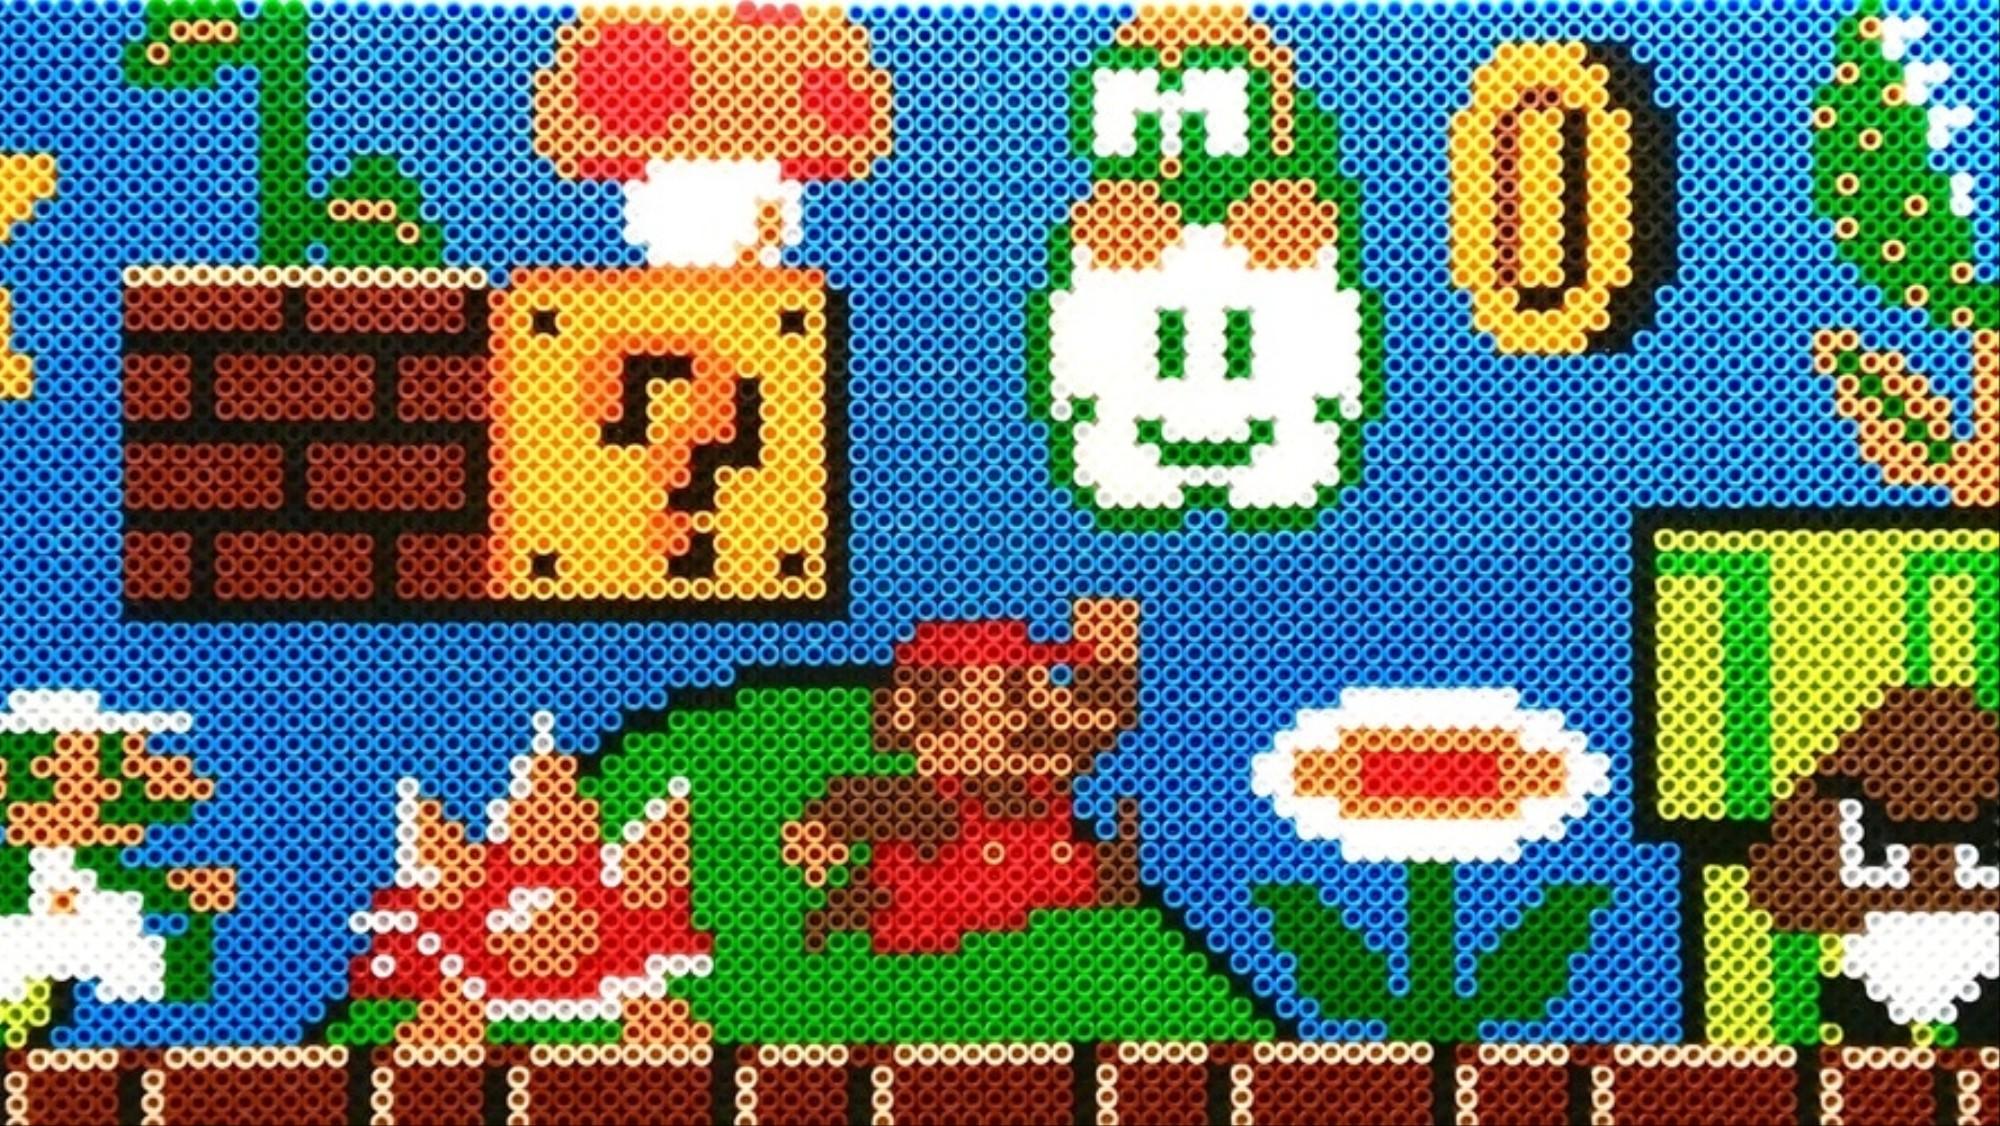 Inside the Pixelated World of Perler Bead Art - VICE